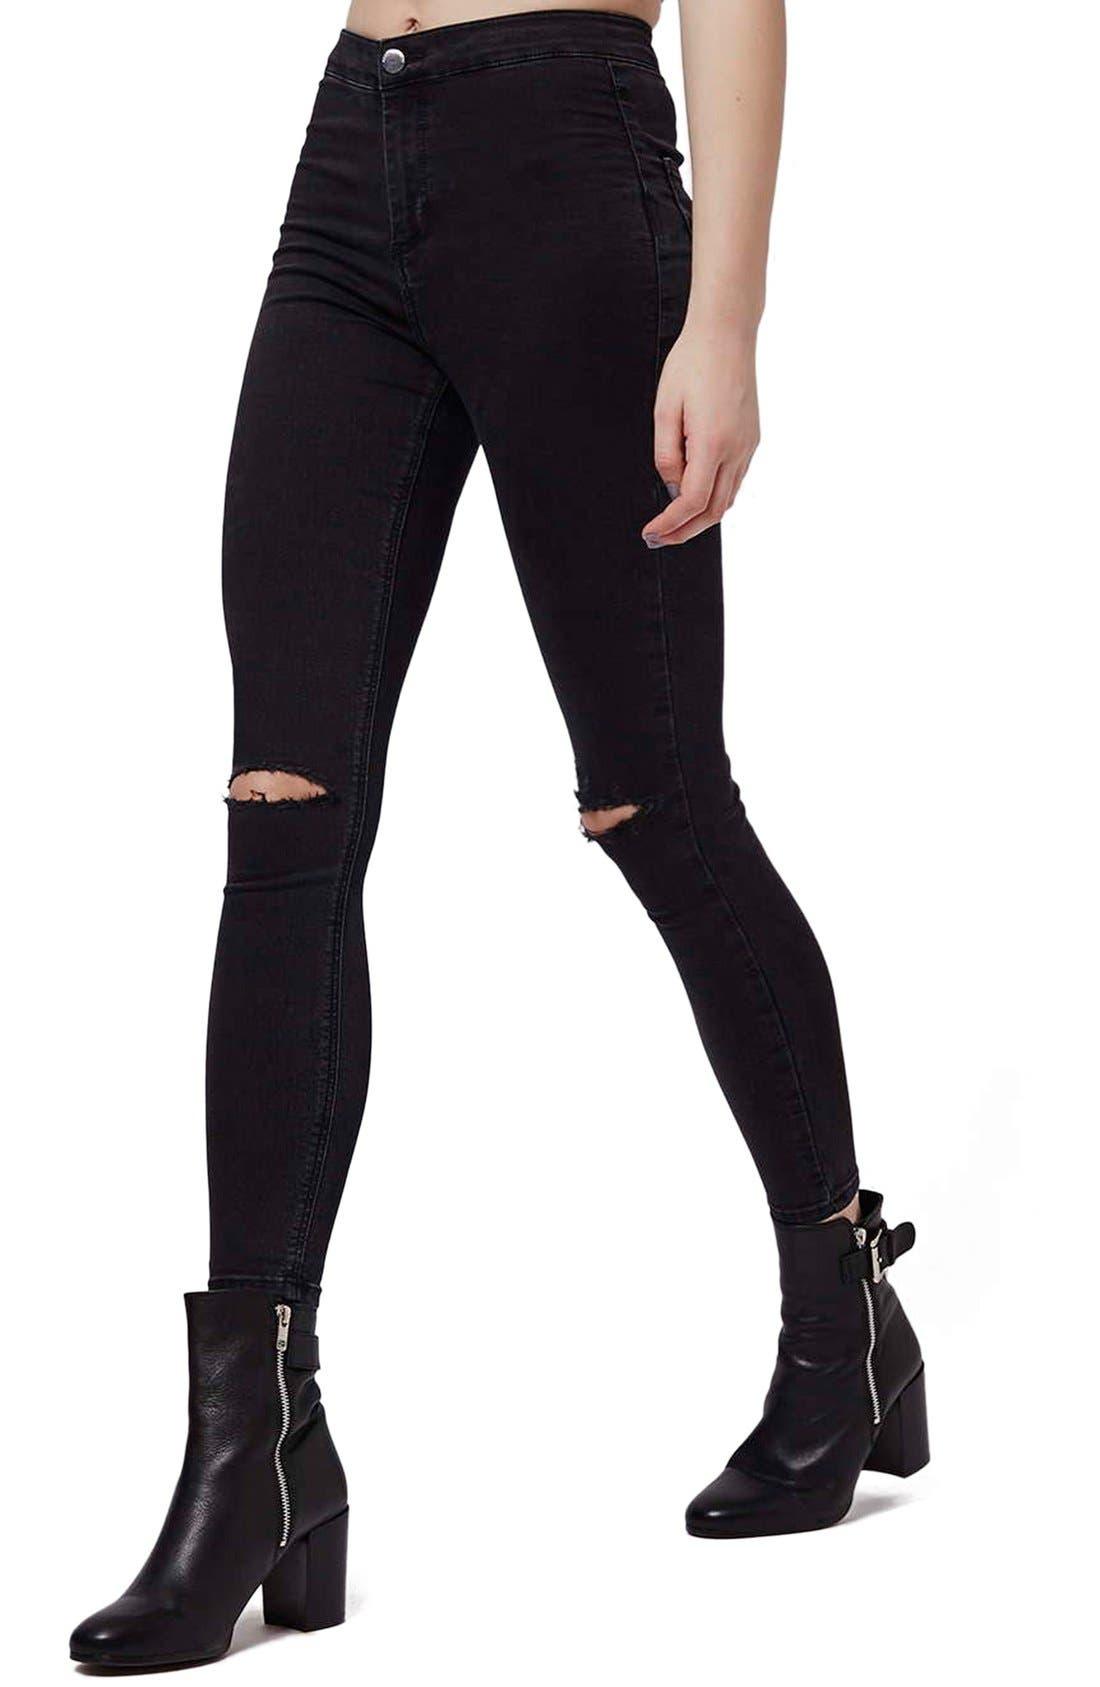 Alternate Image 1 Selected - Topshop Moto 'Joni' Ripped High Rise Skinny Jeans (Petite)